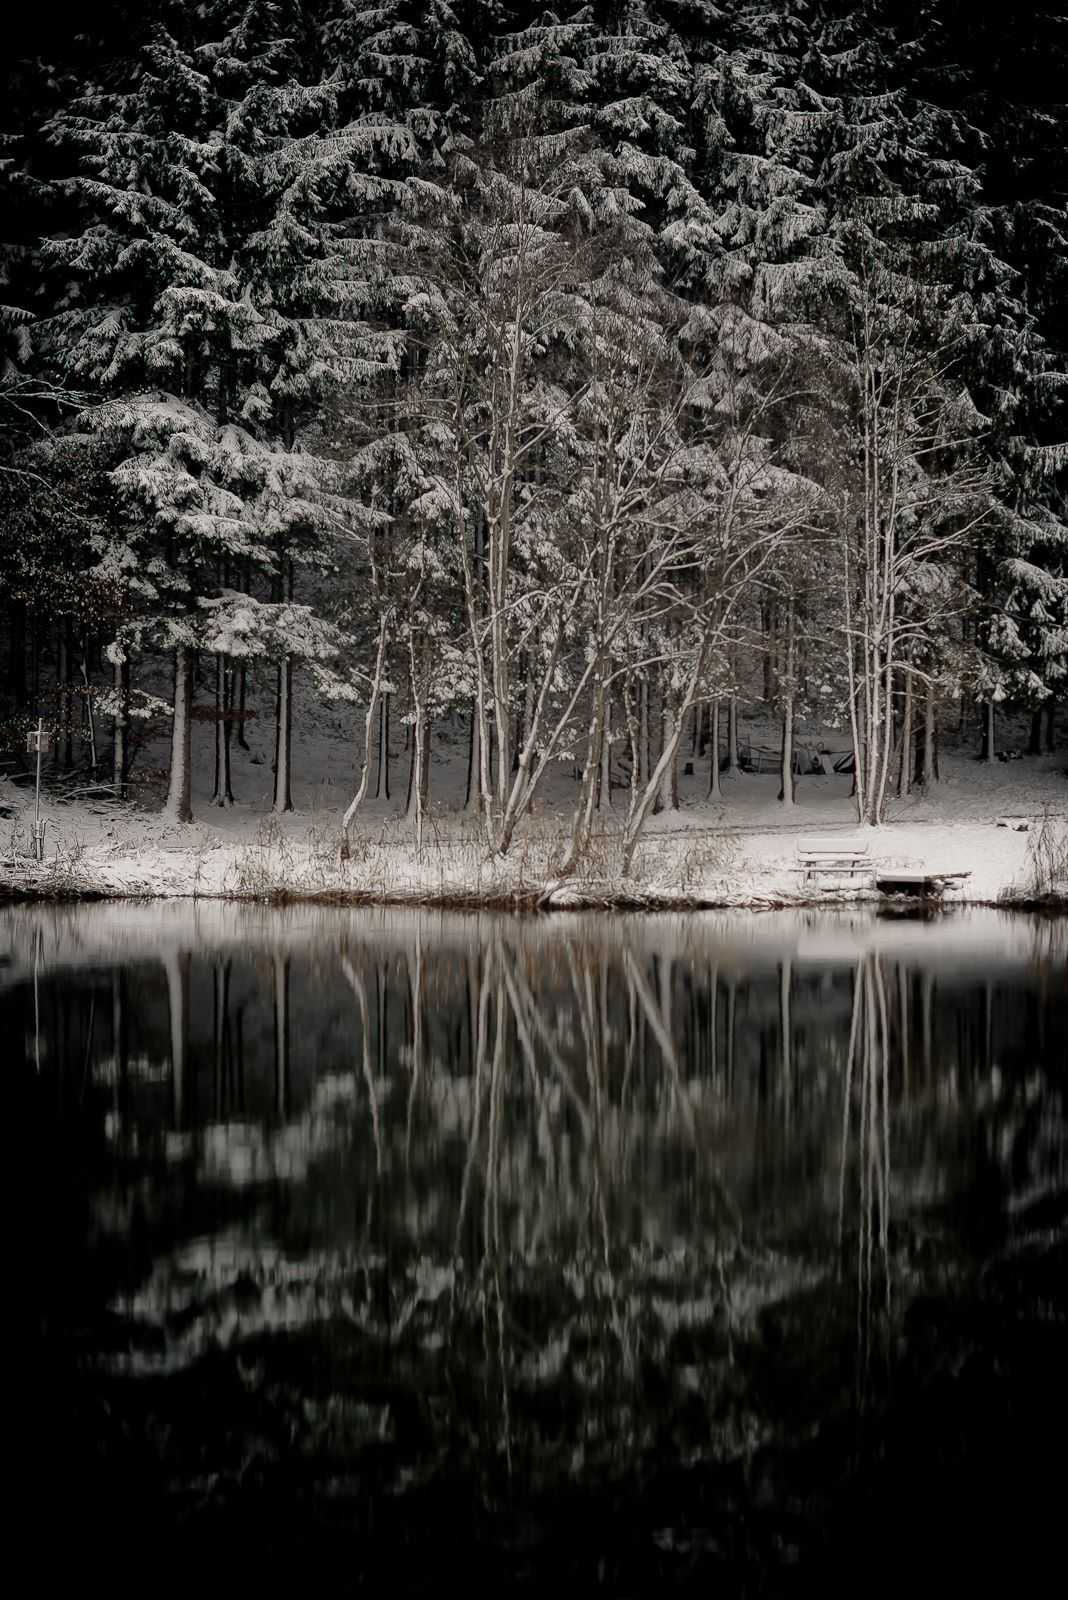 ceekayone: November 2012 Winter begins …